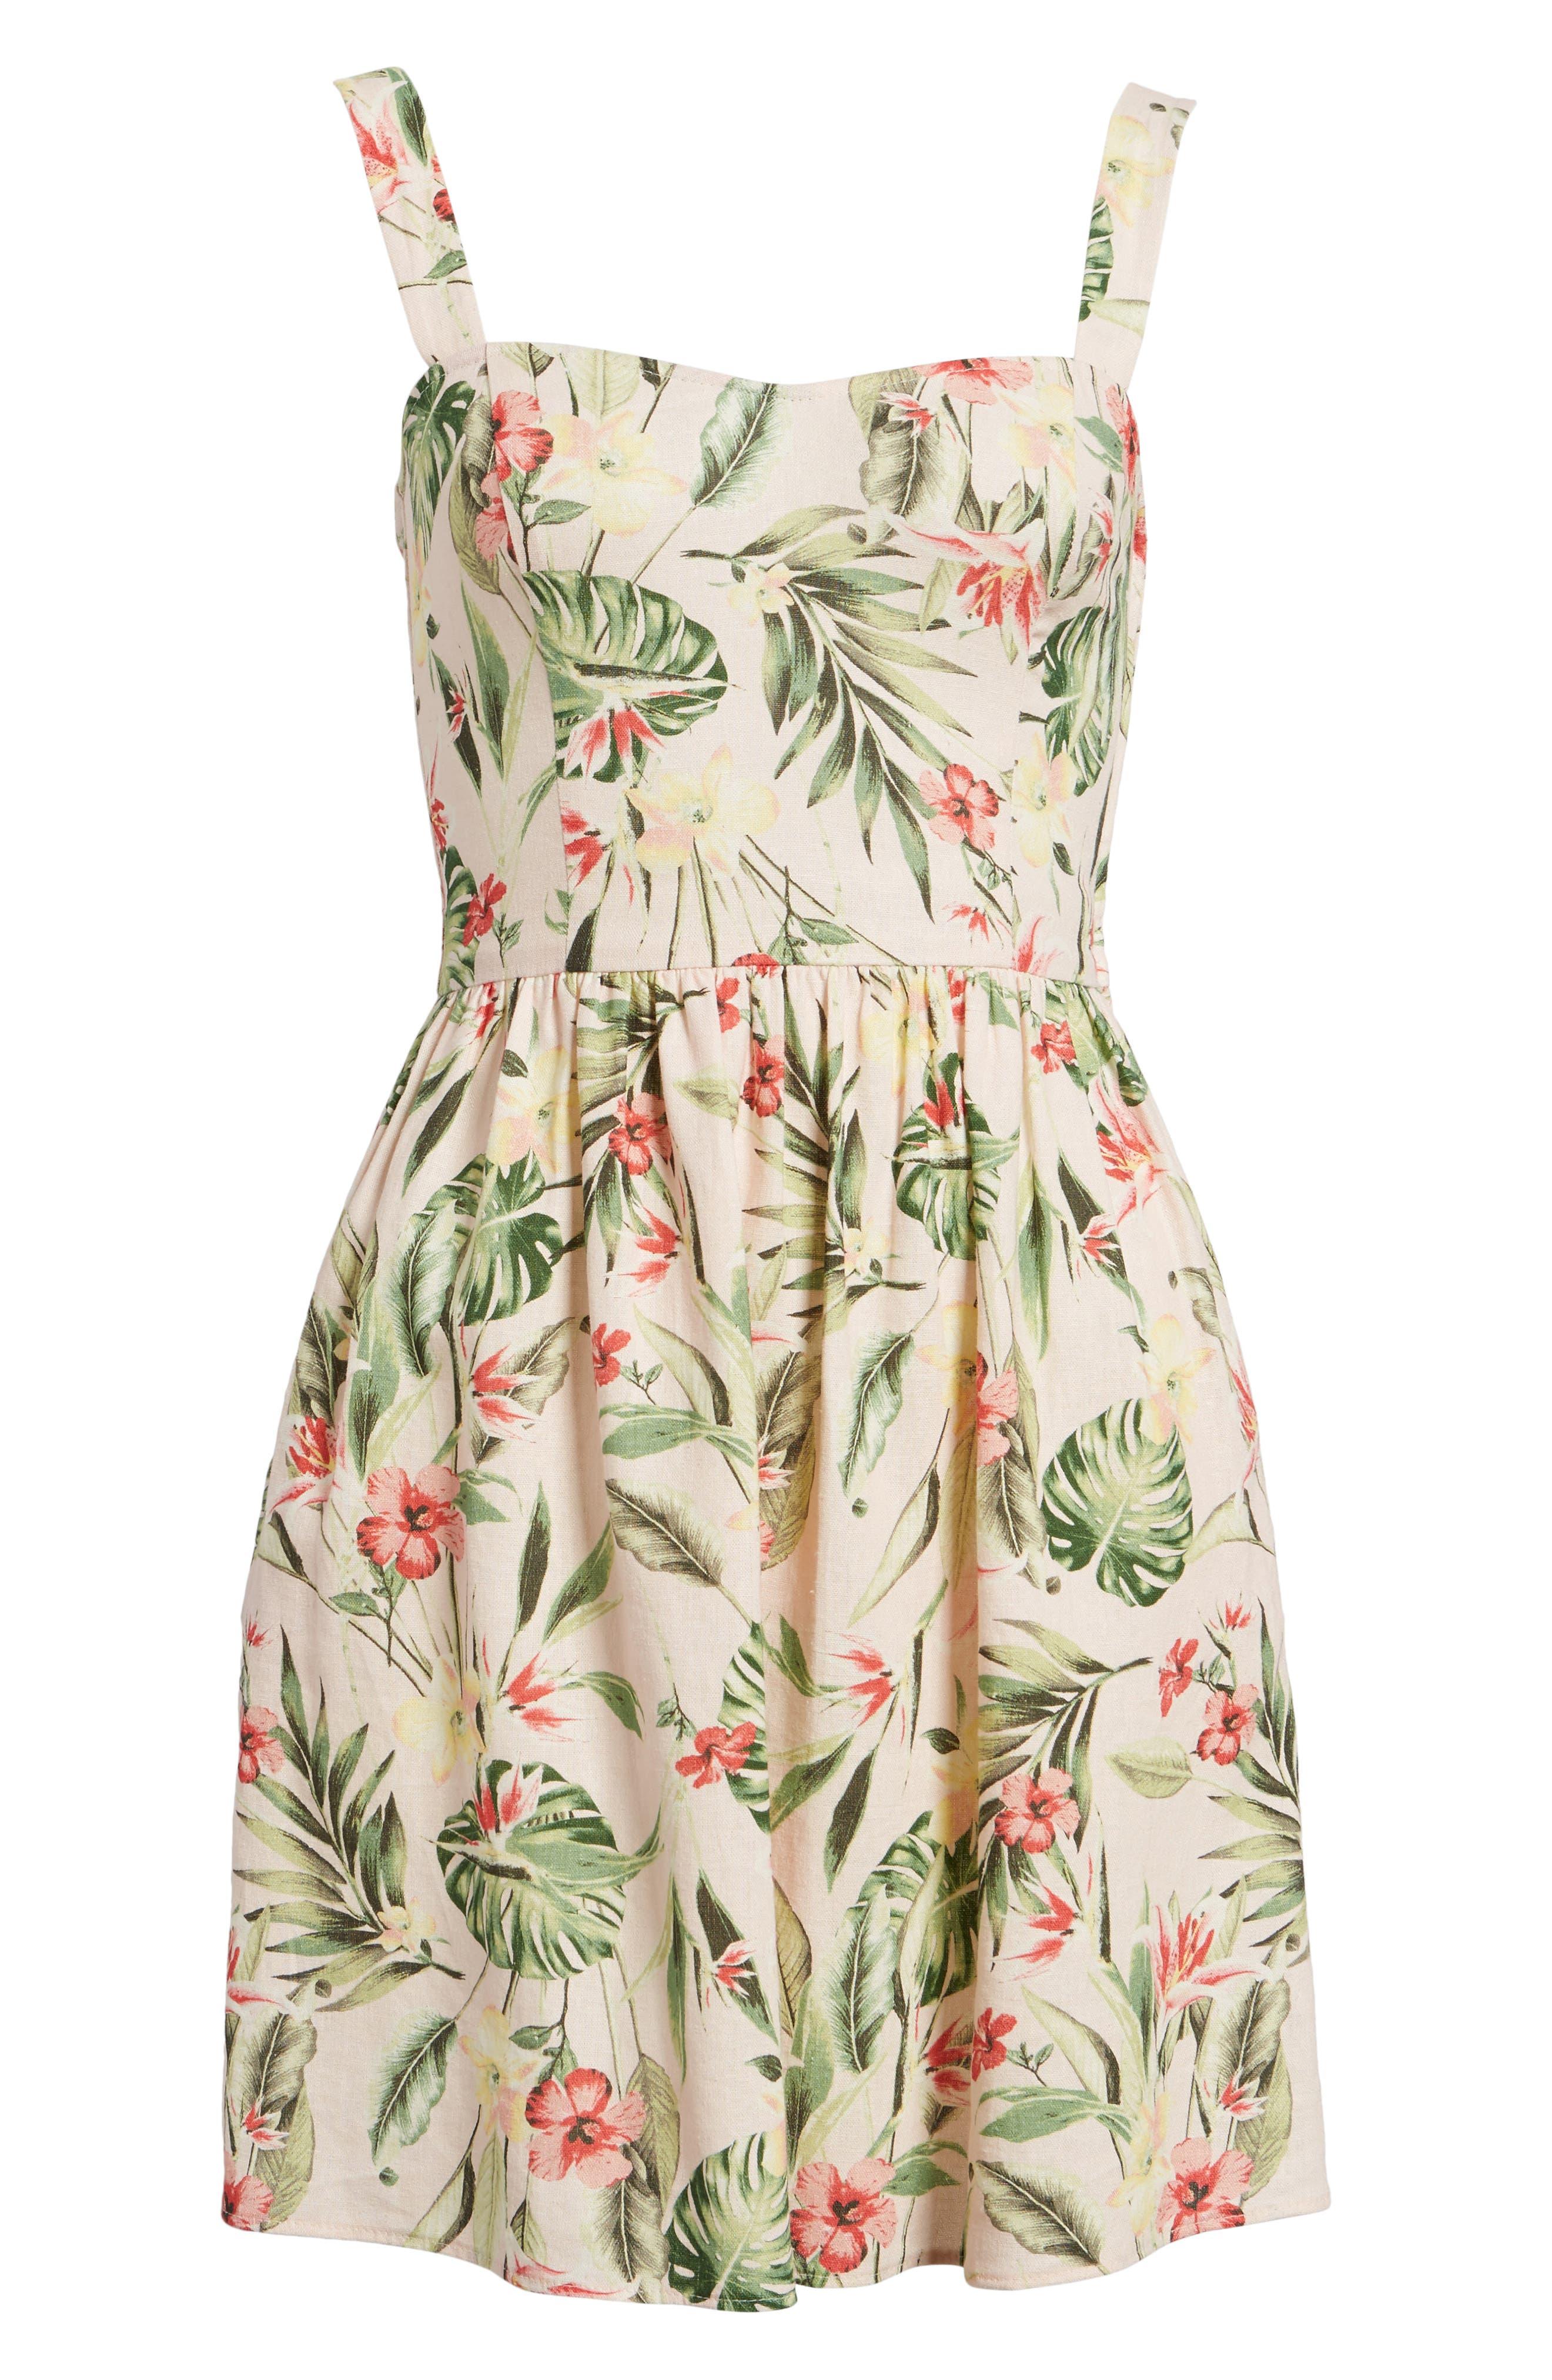 Tropical Lace Back Minidress,                             Alternate thumbnail 6, color,                             Blush/ Green